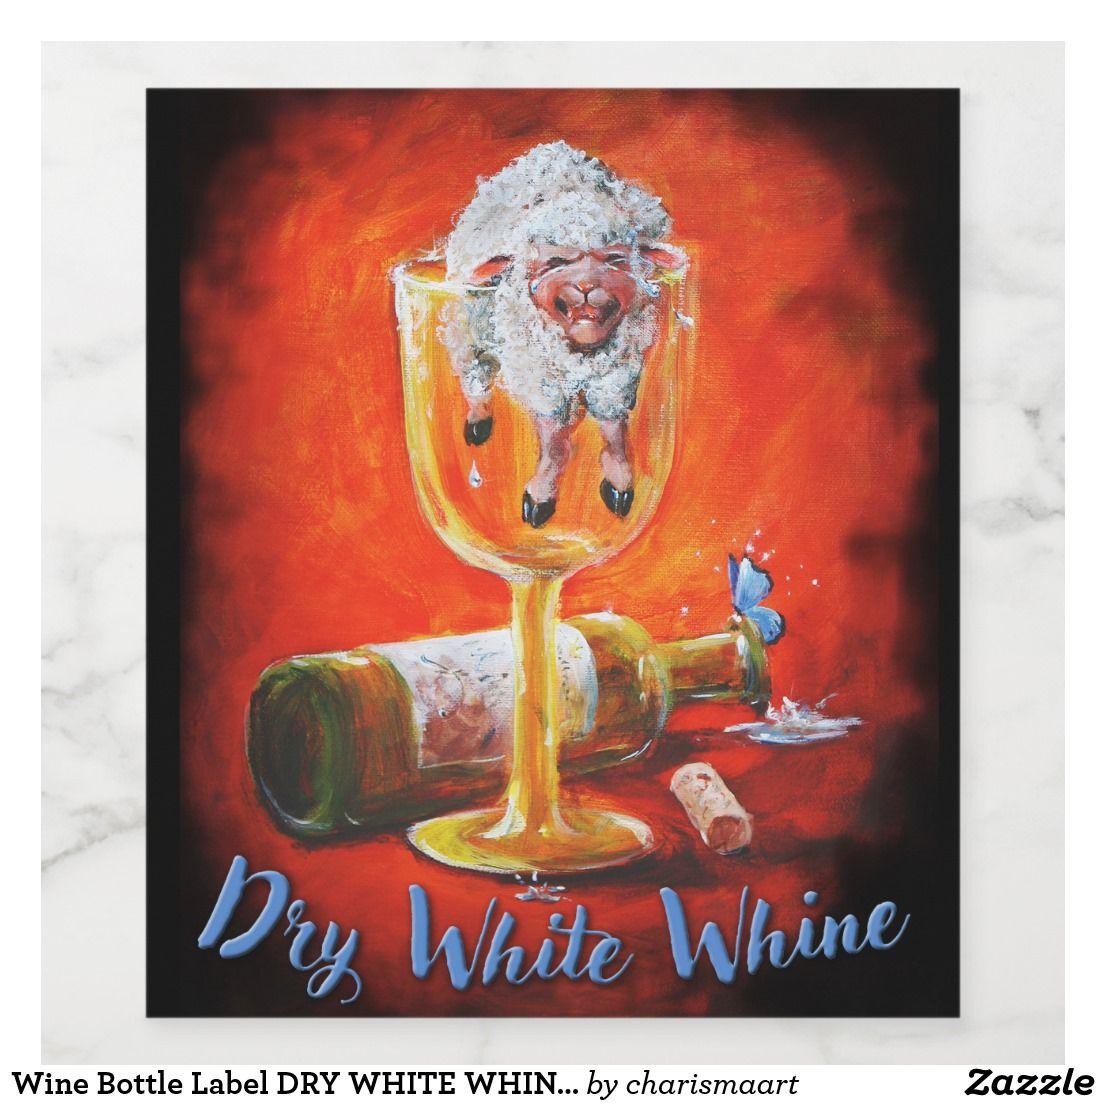 Wine Bottle Label Dry White Whine Sheep Incognito Zazzle Com Wine Bottle Labels Wine Bottle Label Design Custom Wine Labels